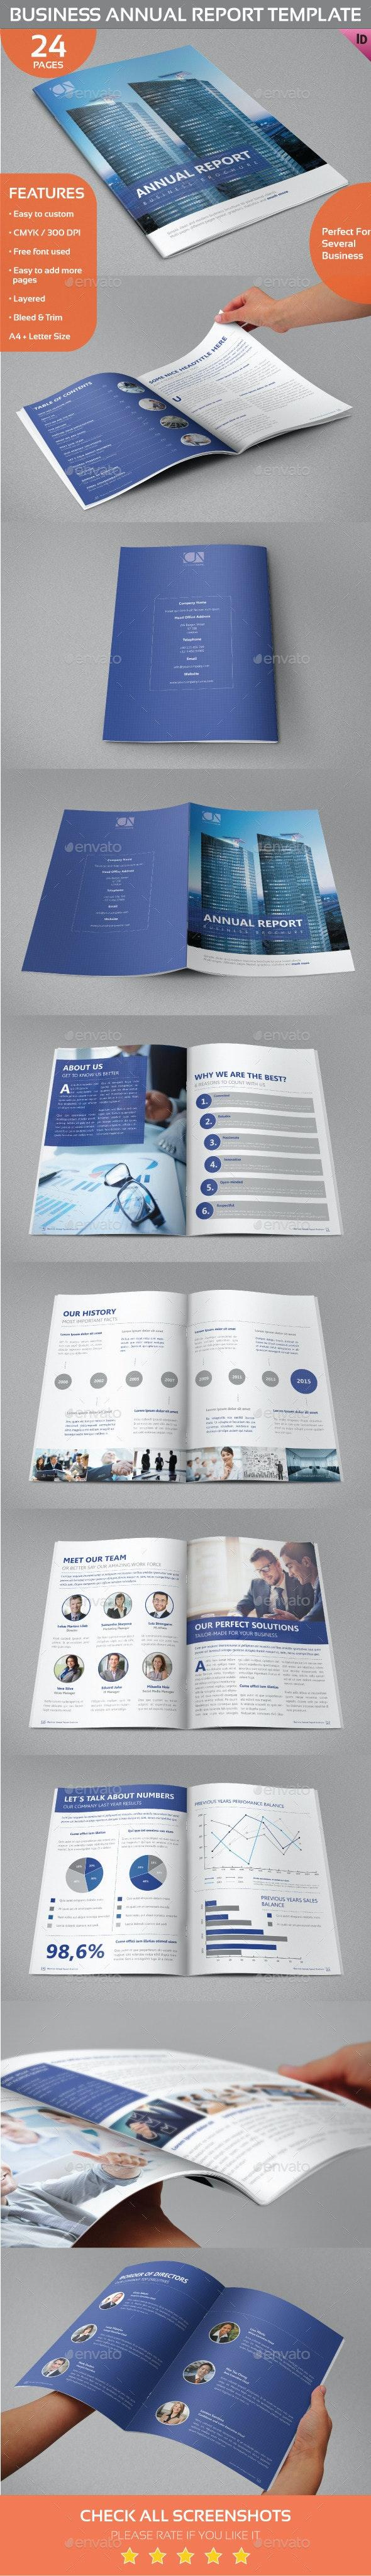 Business Annual Report/Brochure Template - Informational Brochures